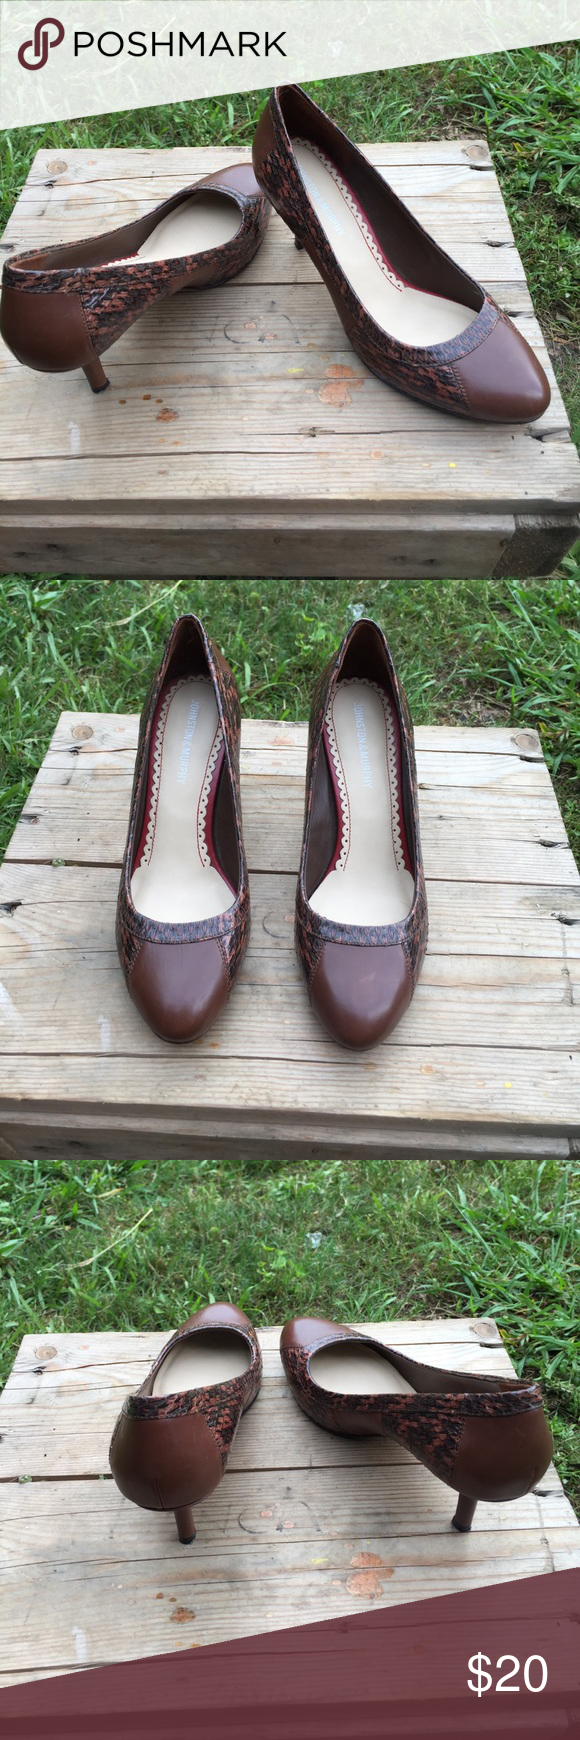 Johnston & Murphy heels Size 6 1/2, no flaws, ships today💕 Johnston & Murphy Shoes Heels